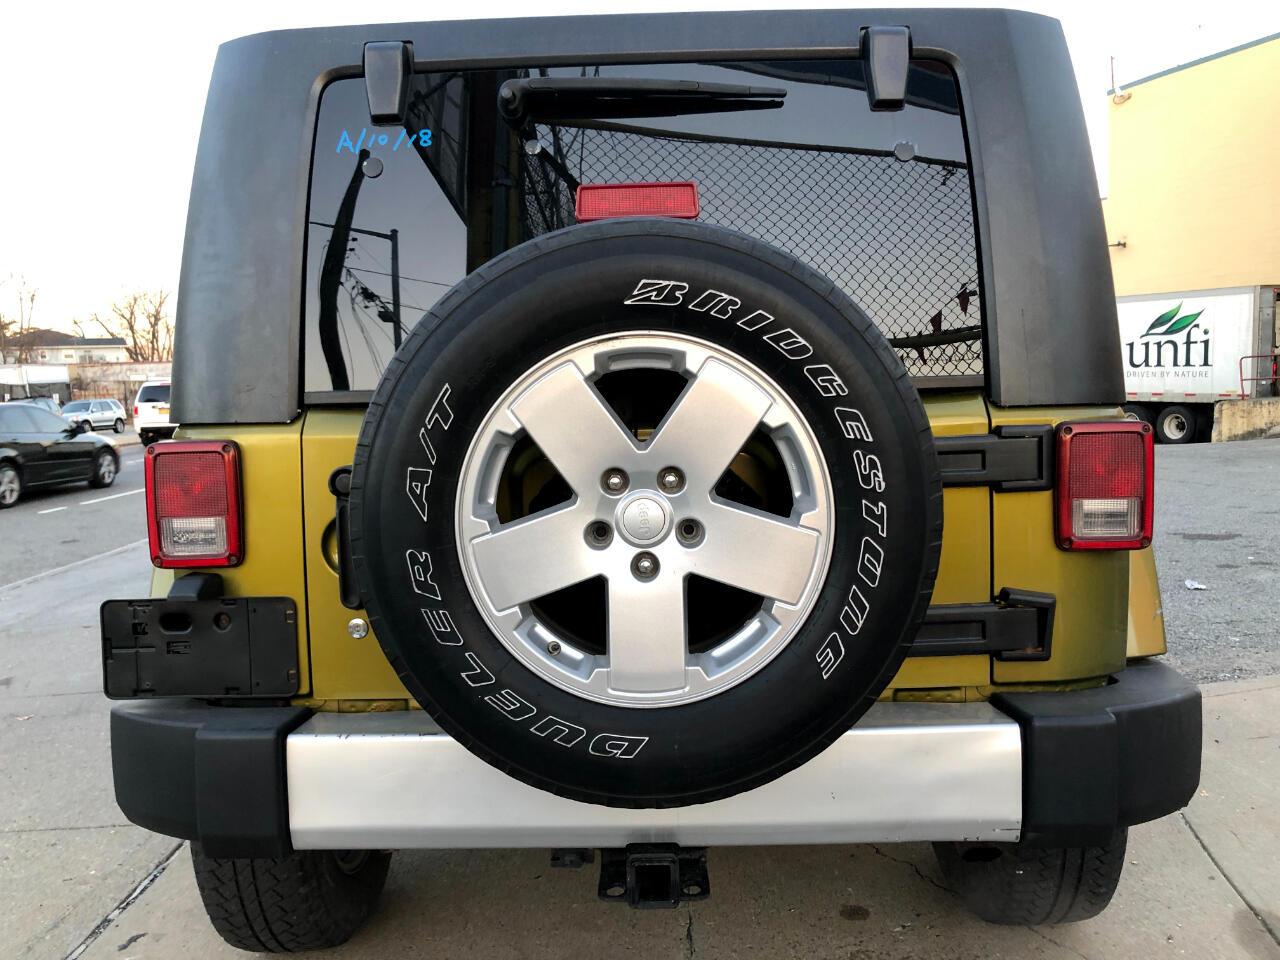 2008 Jeep Wrangler 4WD 4dr Unlimited Sahara